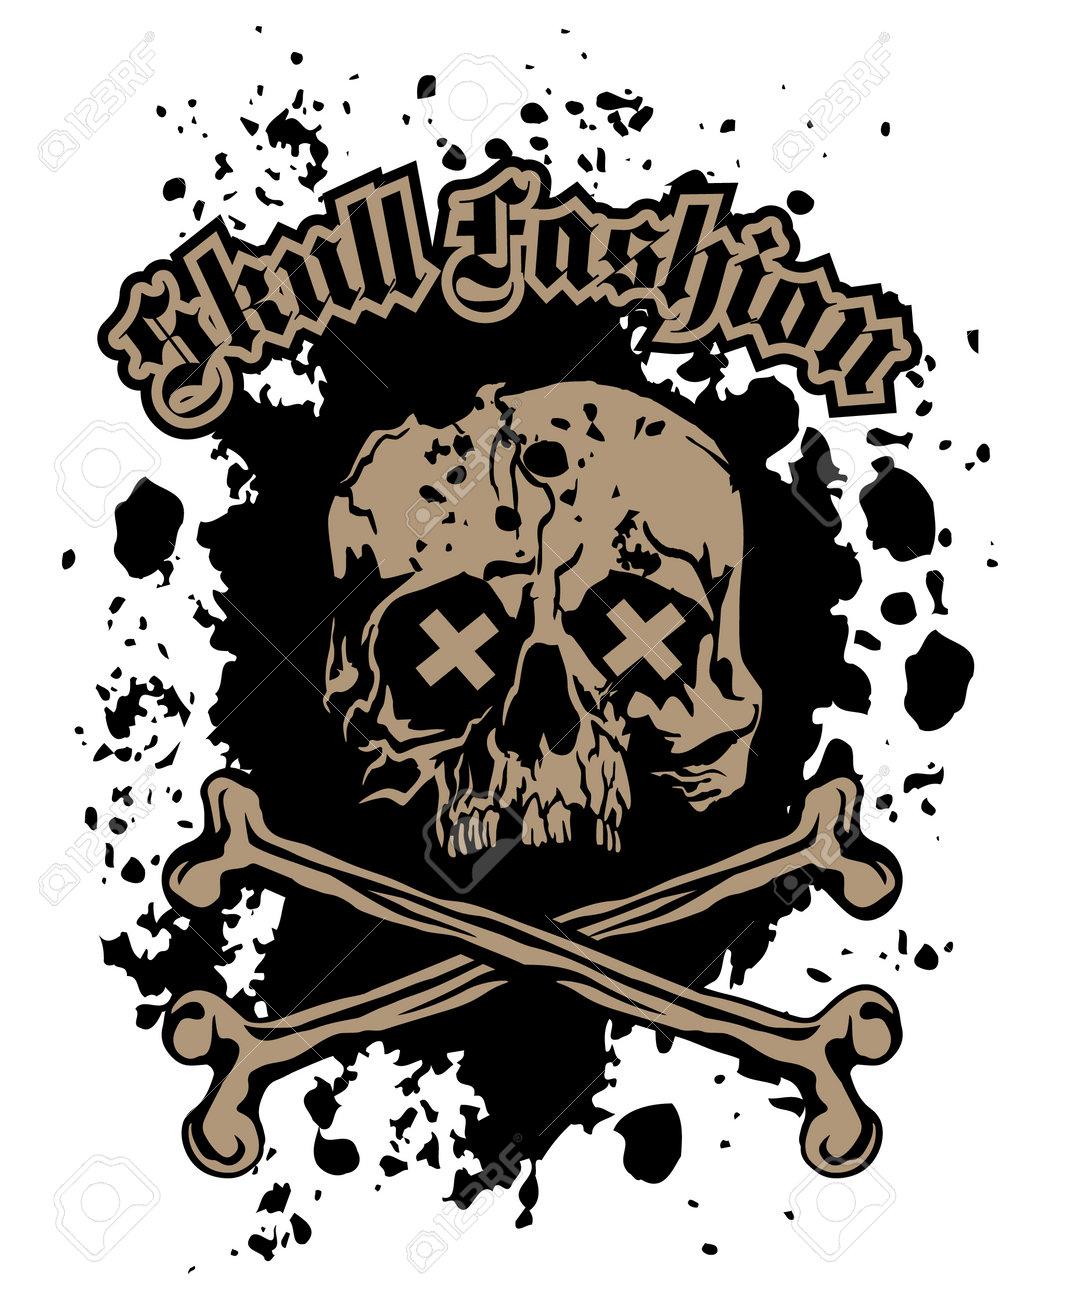 Gothic sign with skull, grunge vintage design t shirts - 169302438